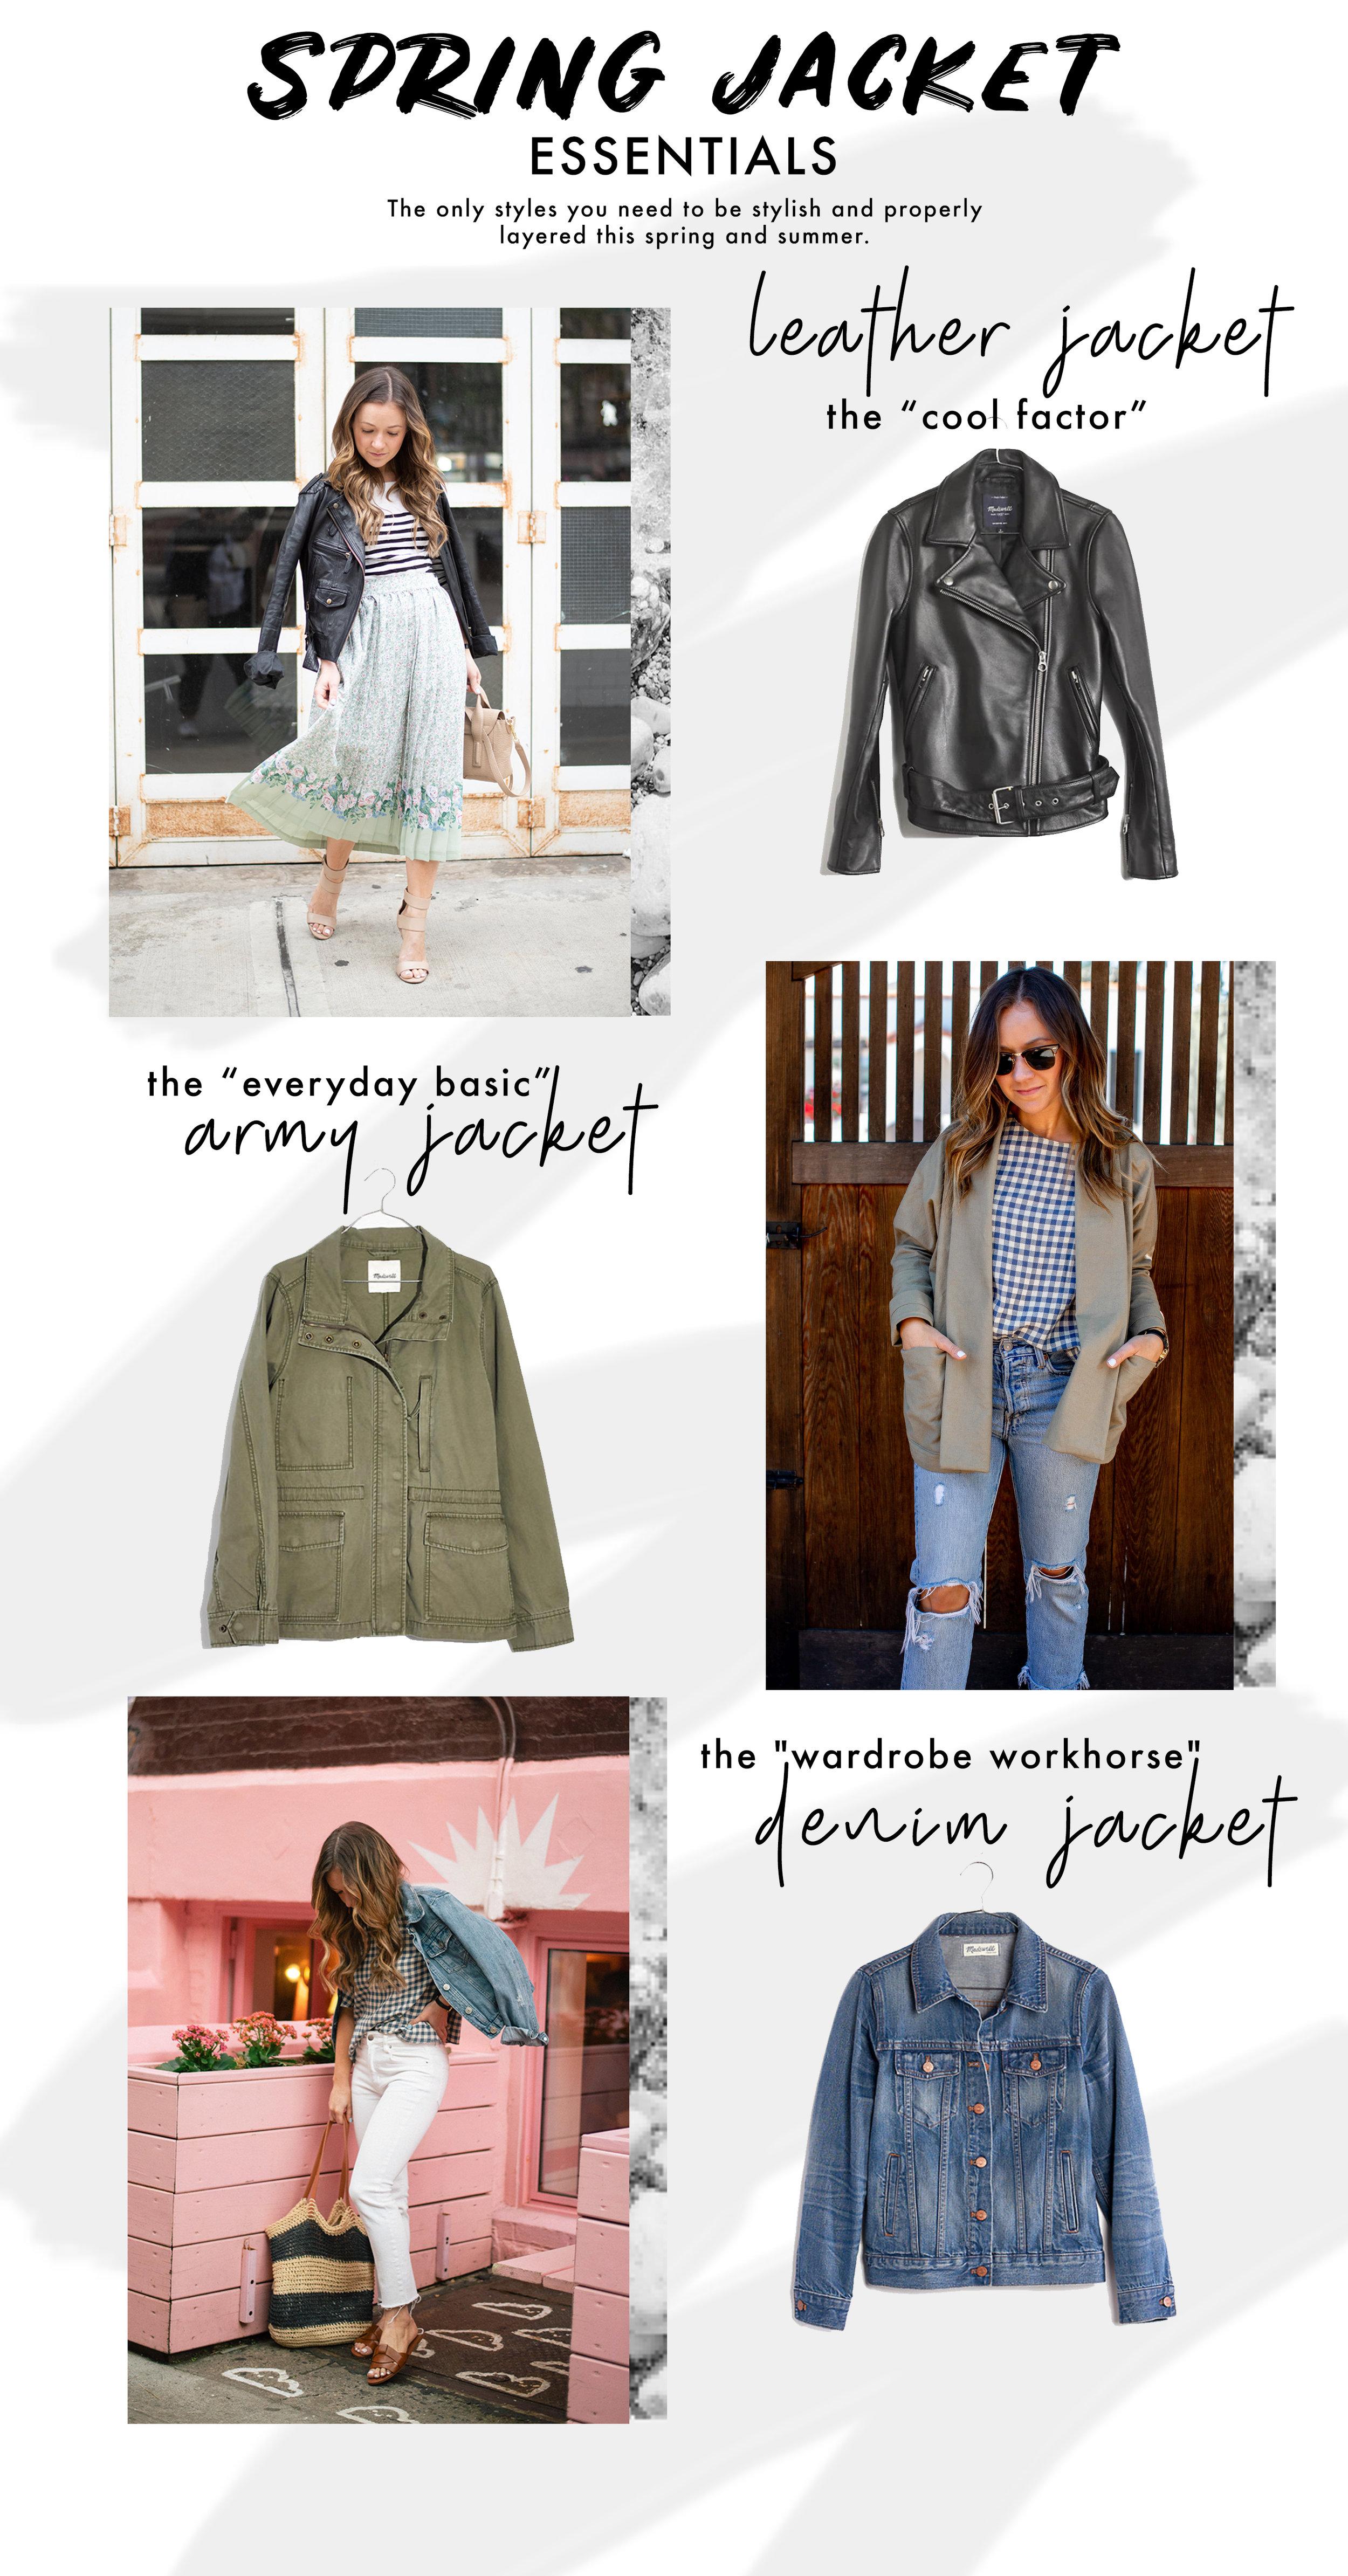 fizz-fade-spring-jacket-essentials.jpg